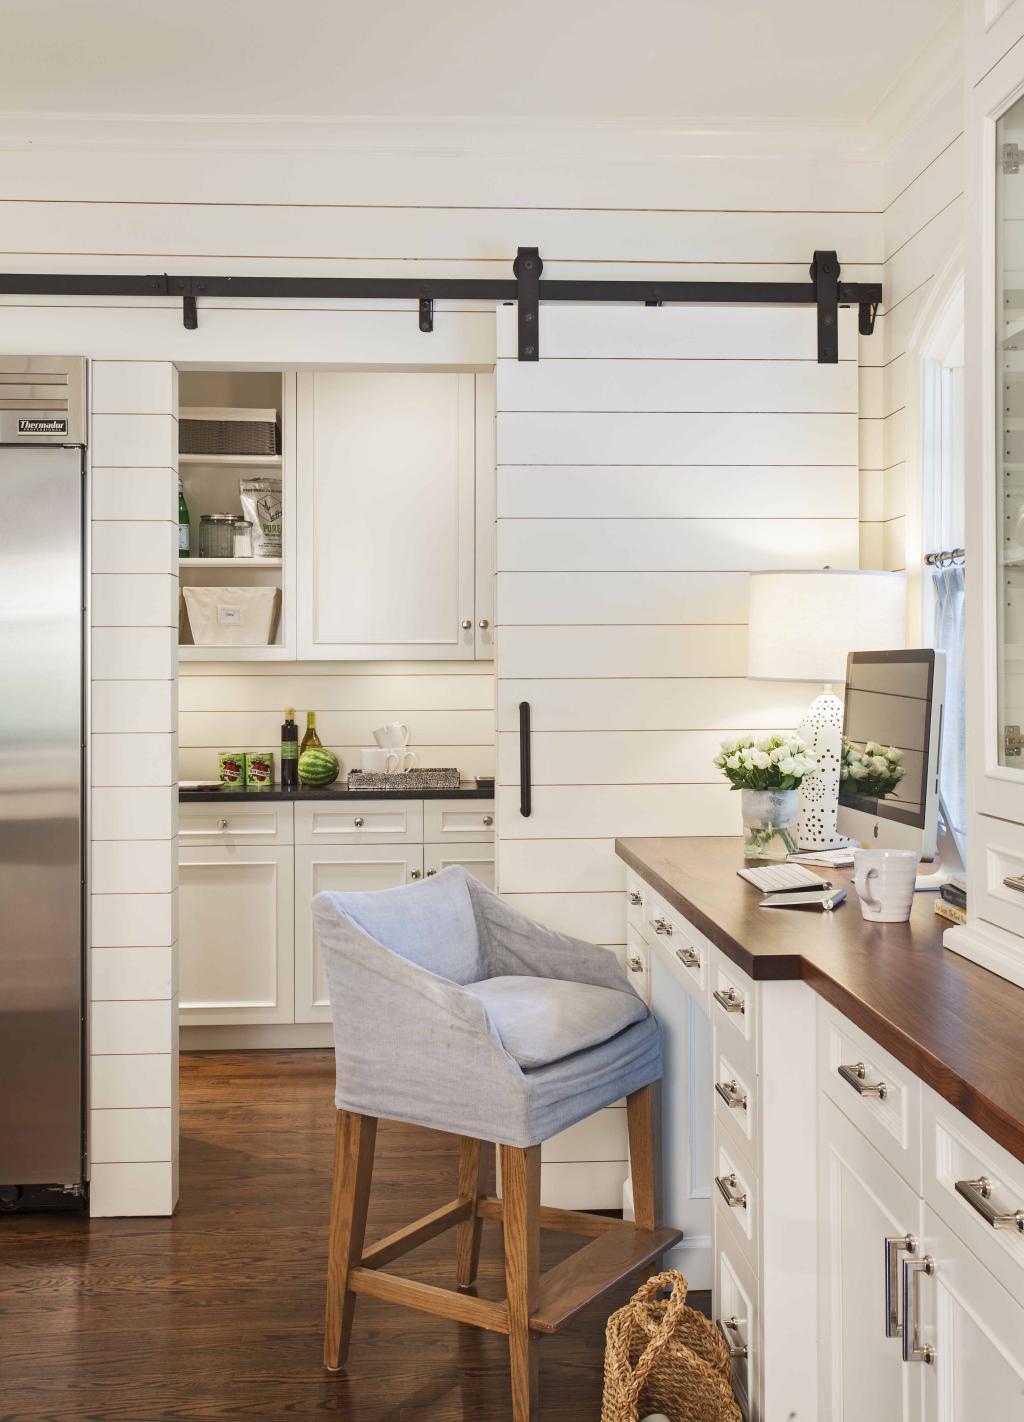 Uncategorized Advanced Kitchen Design advanced renovations charlotte remodeling contractor red fox kitchen bath